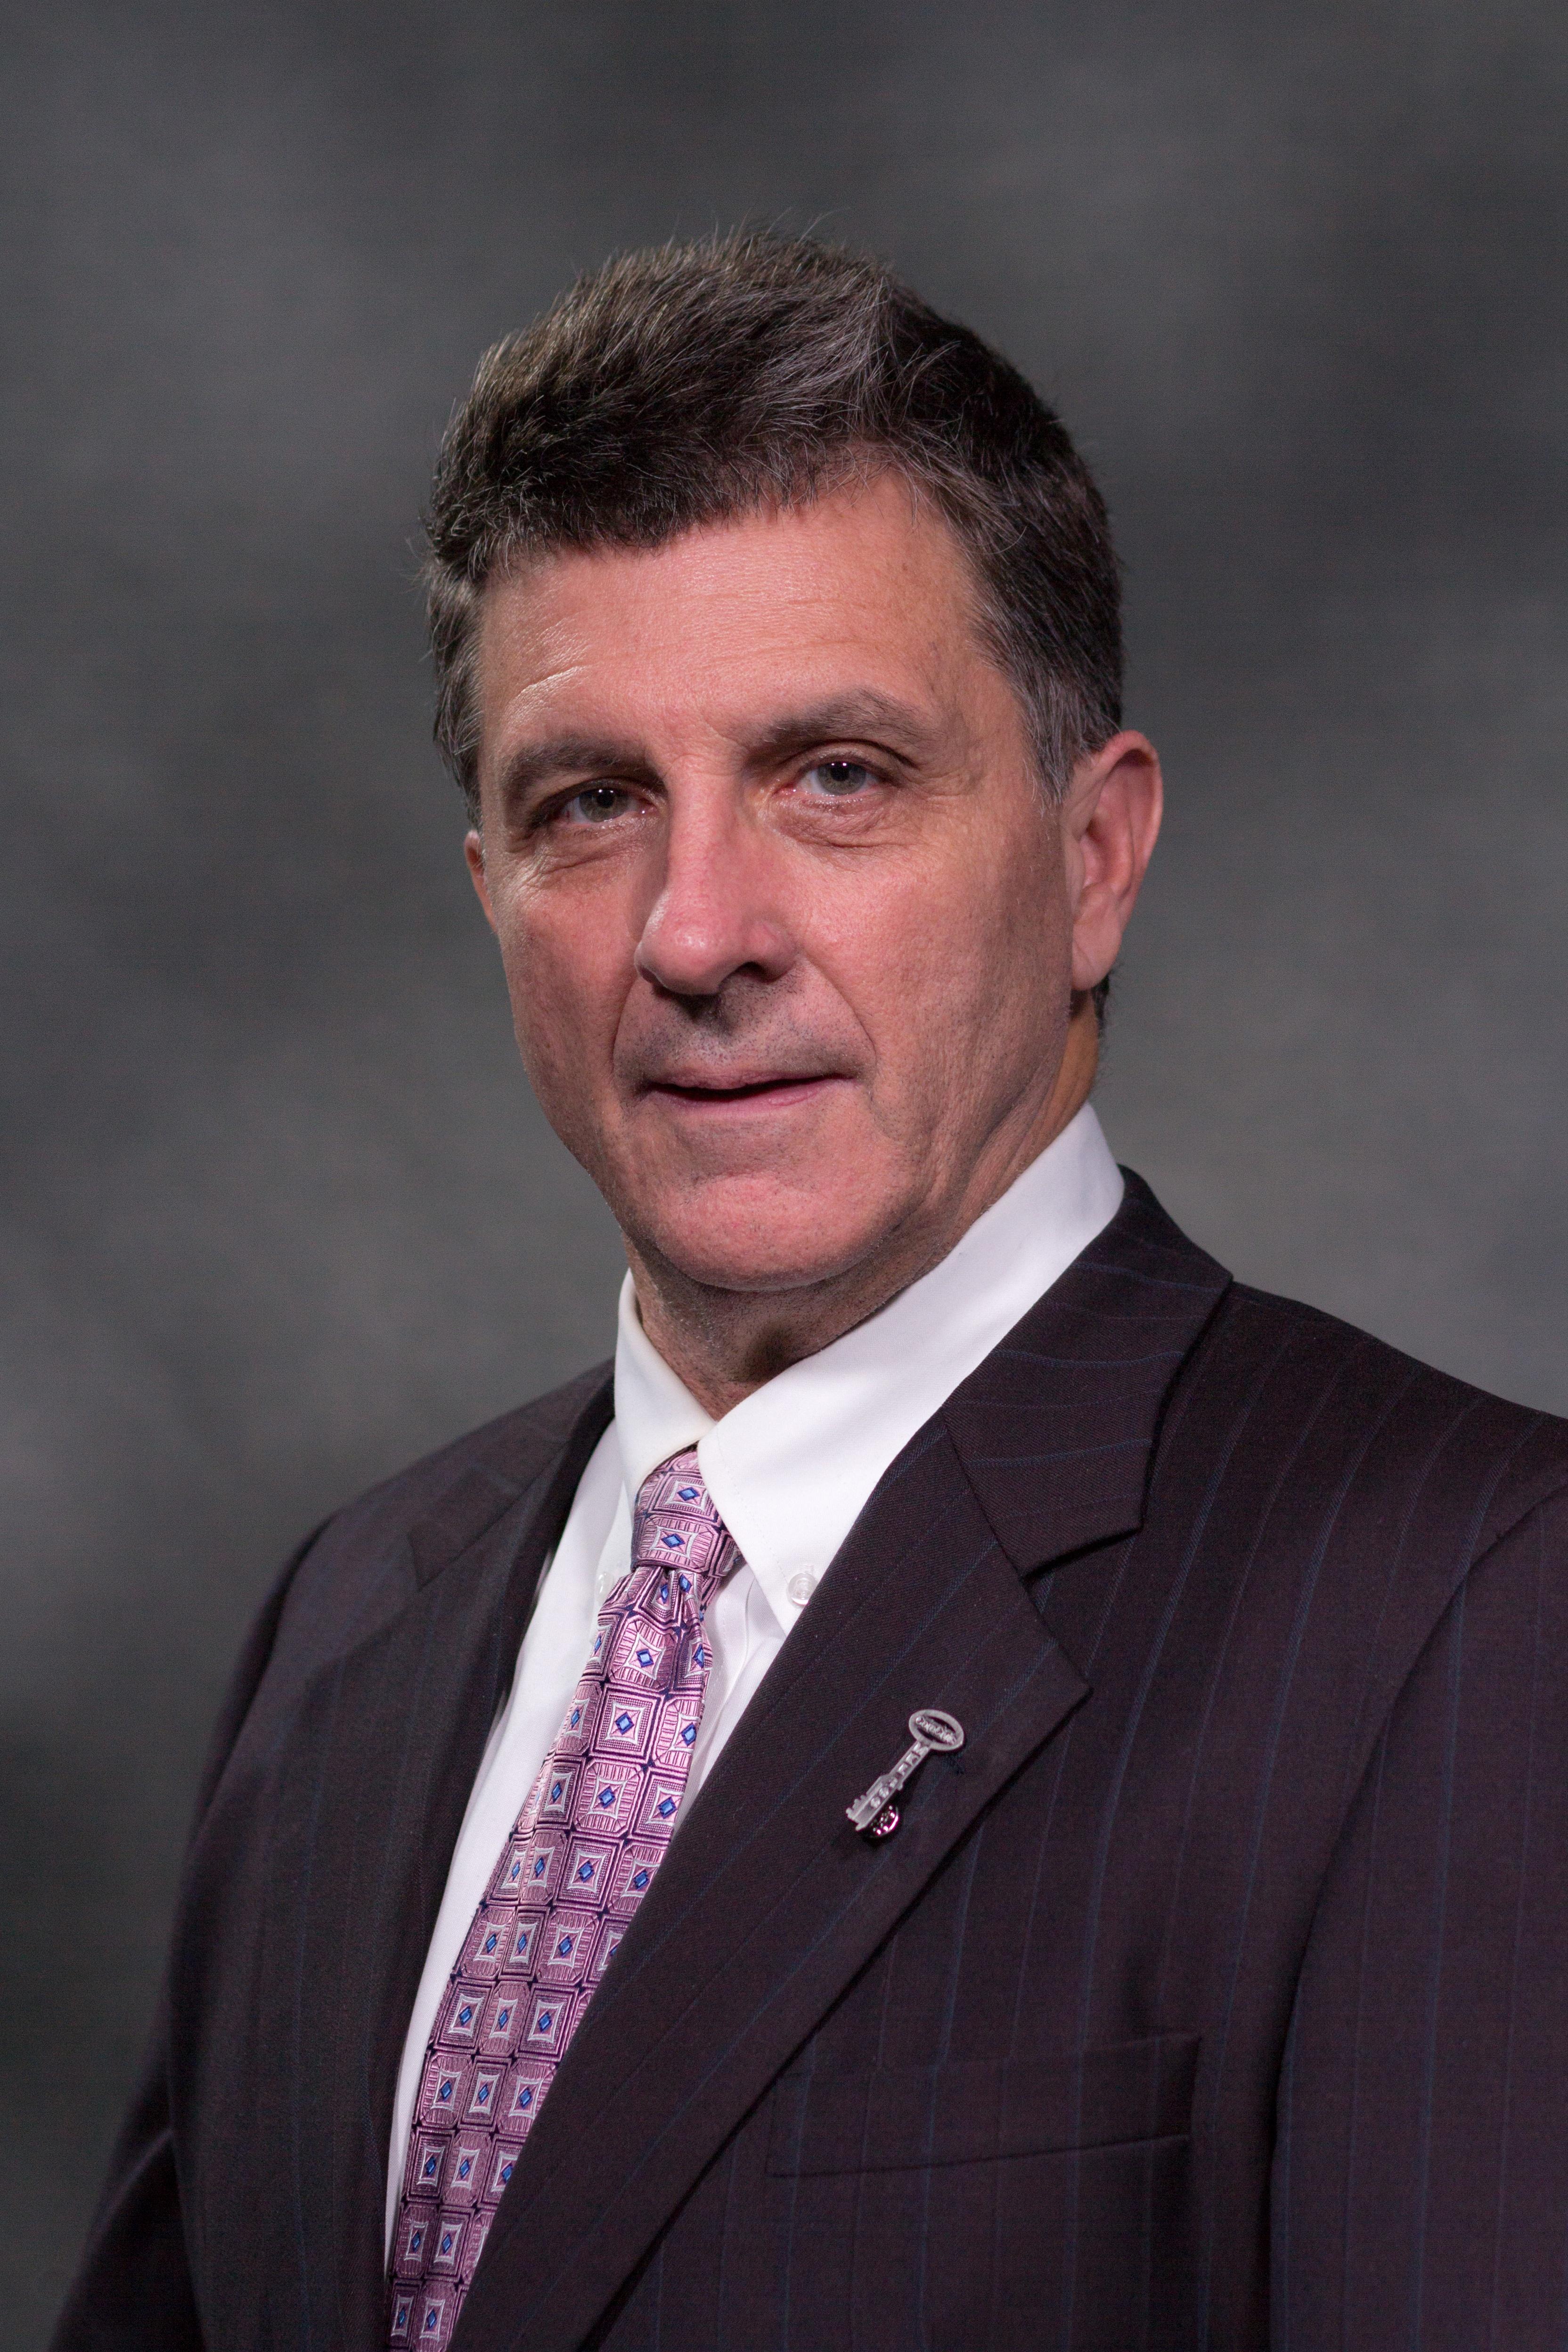 Michael Easley, Facility Director